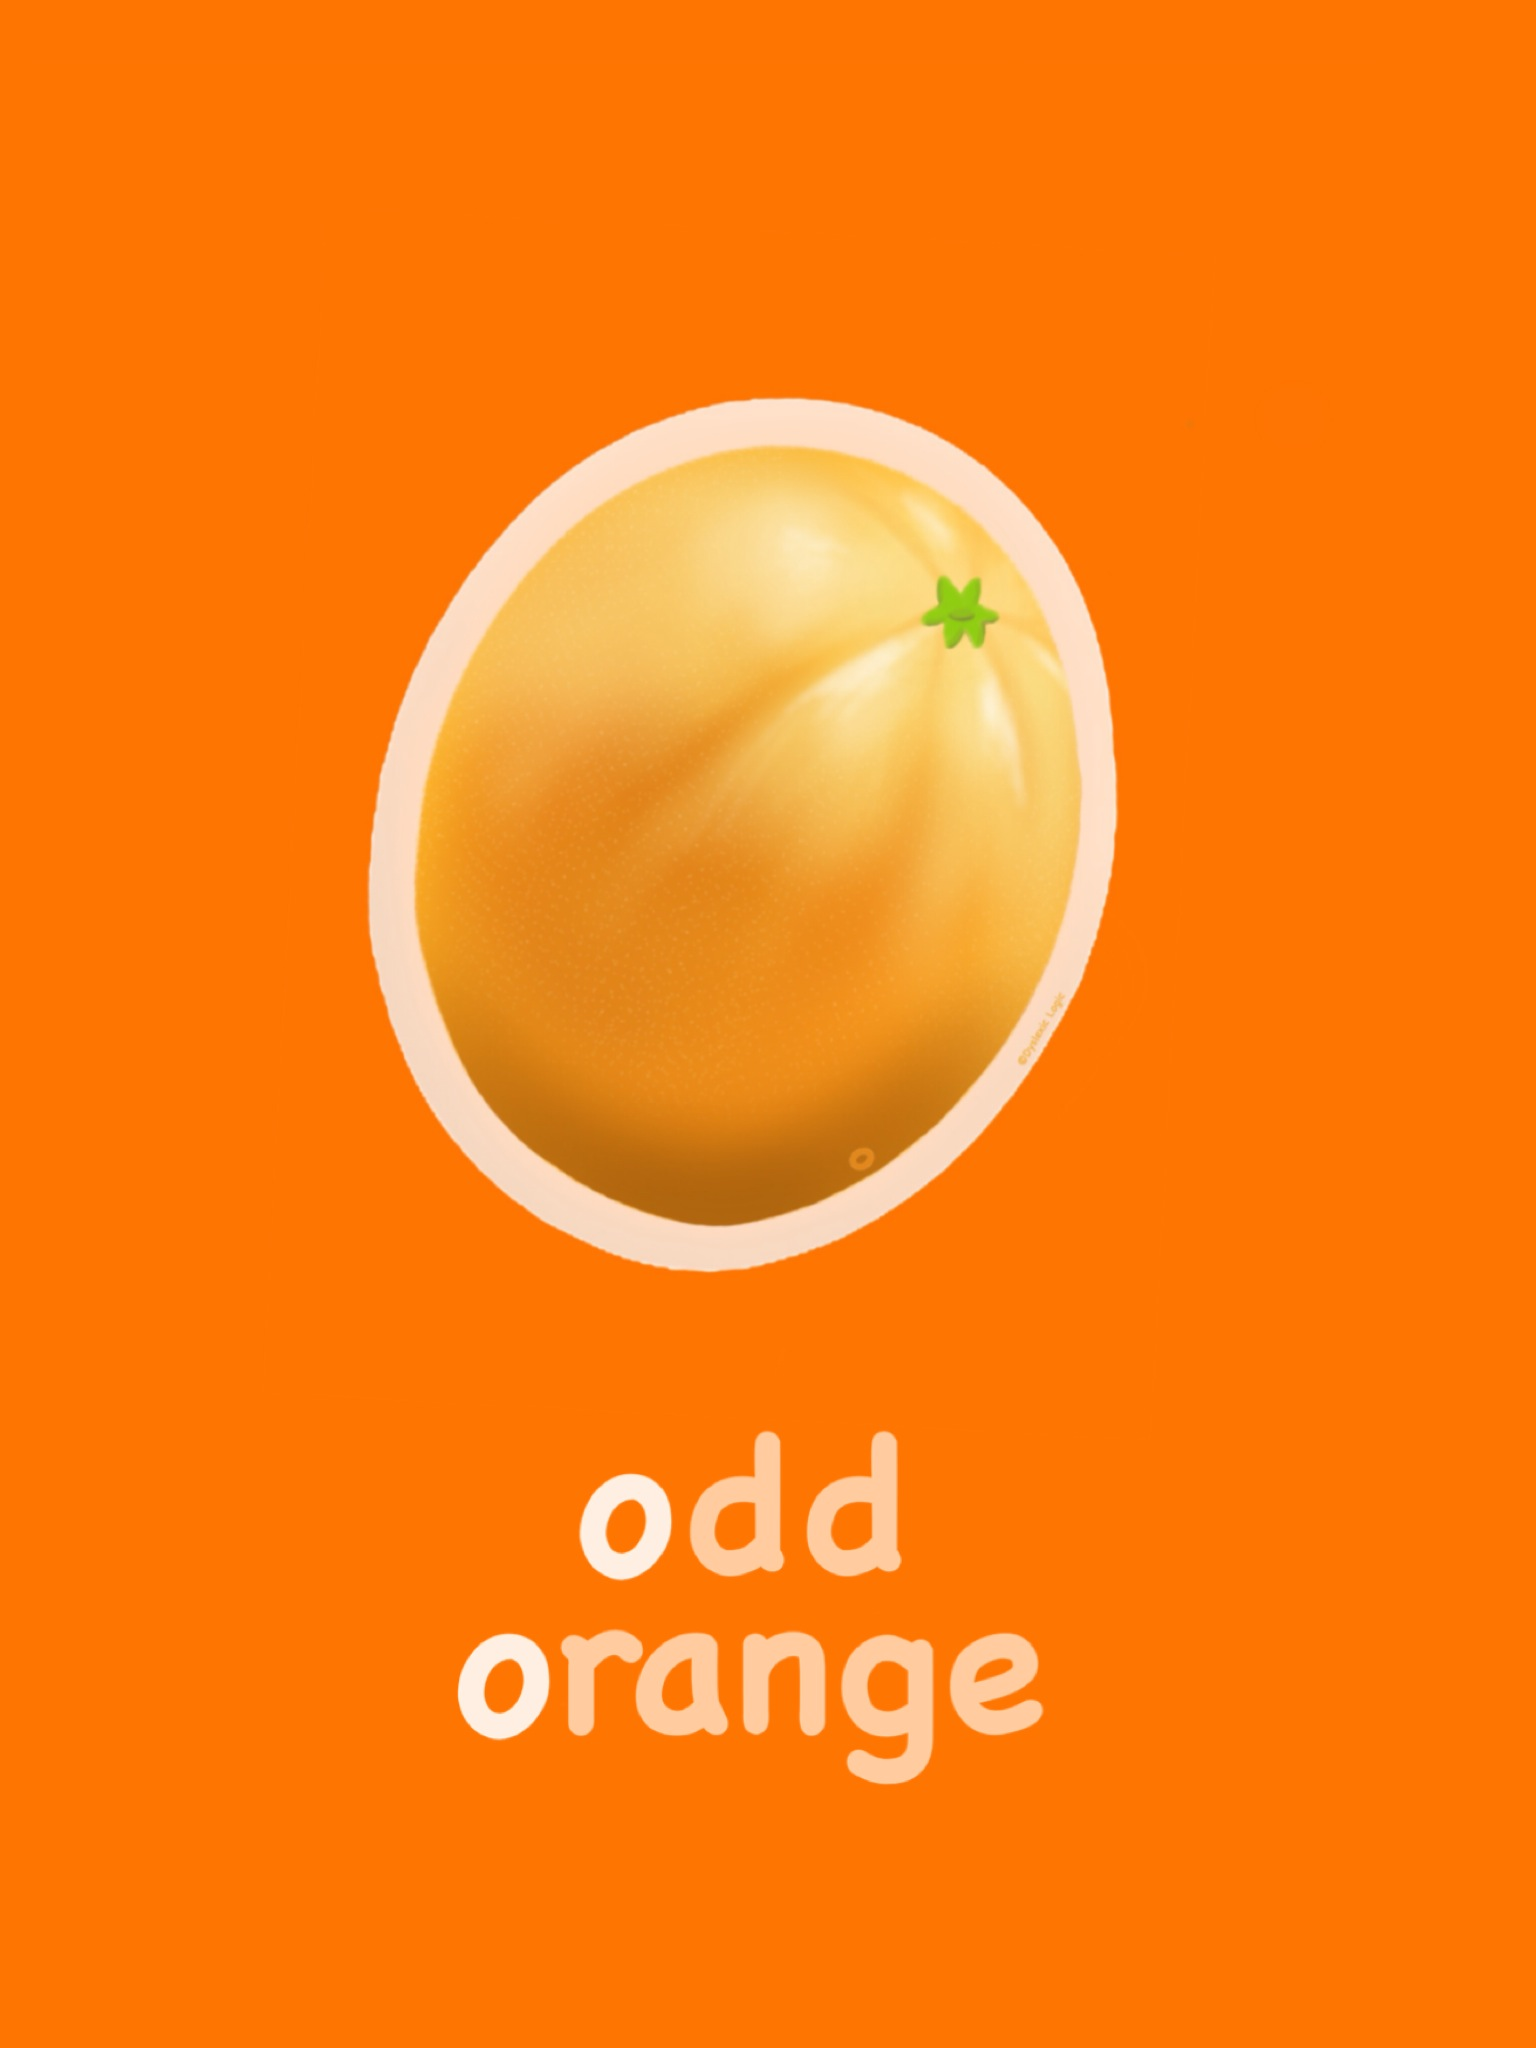 Letter O - Odd Orange